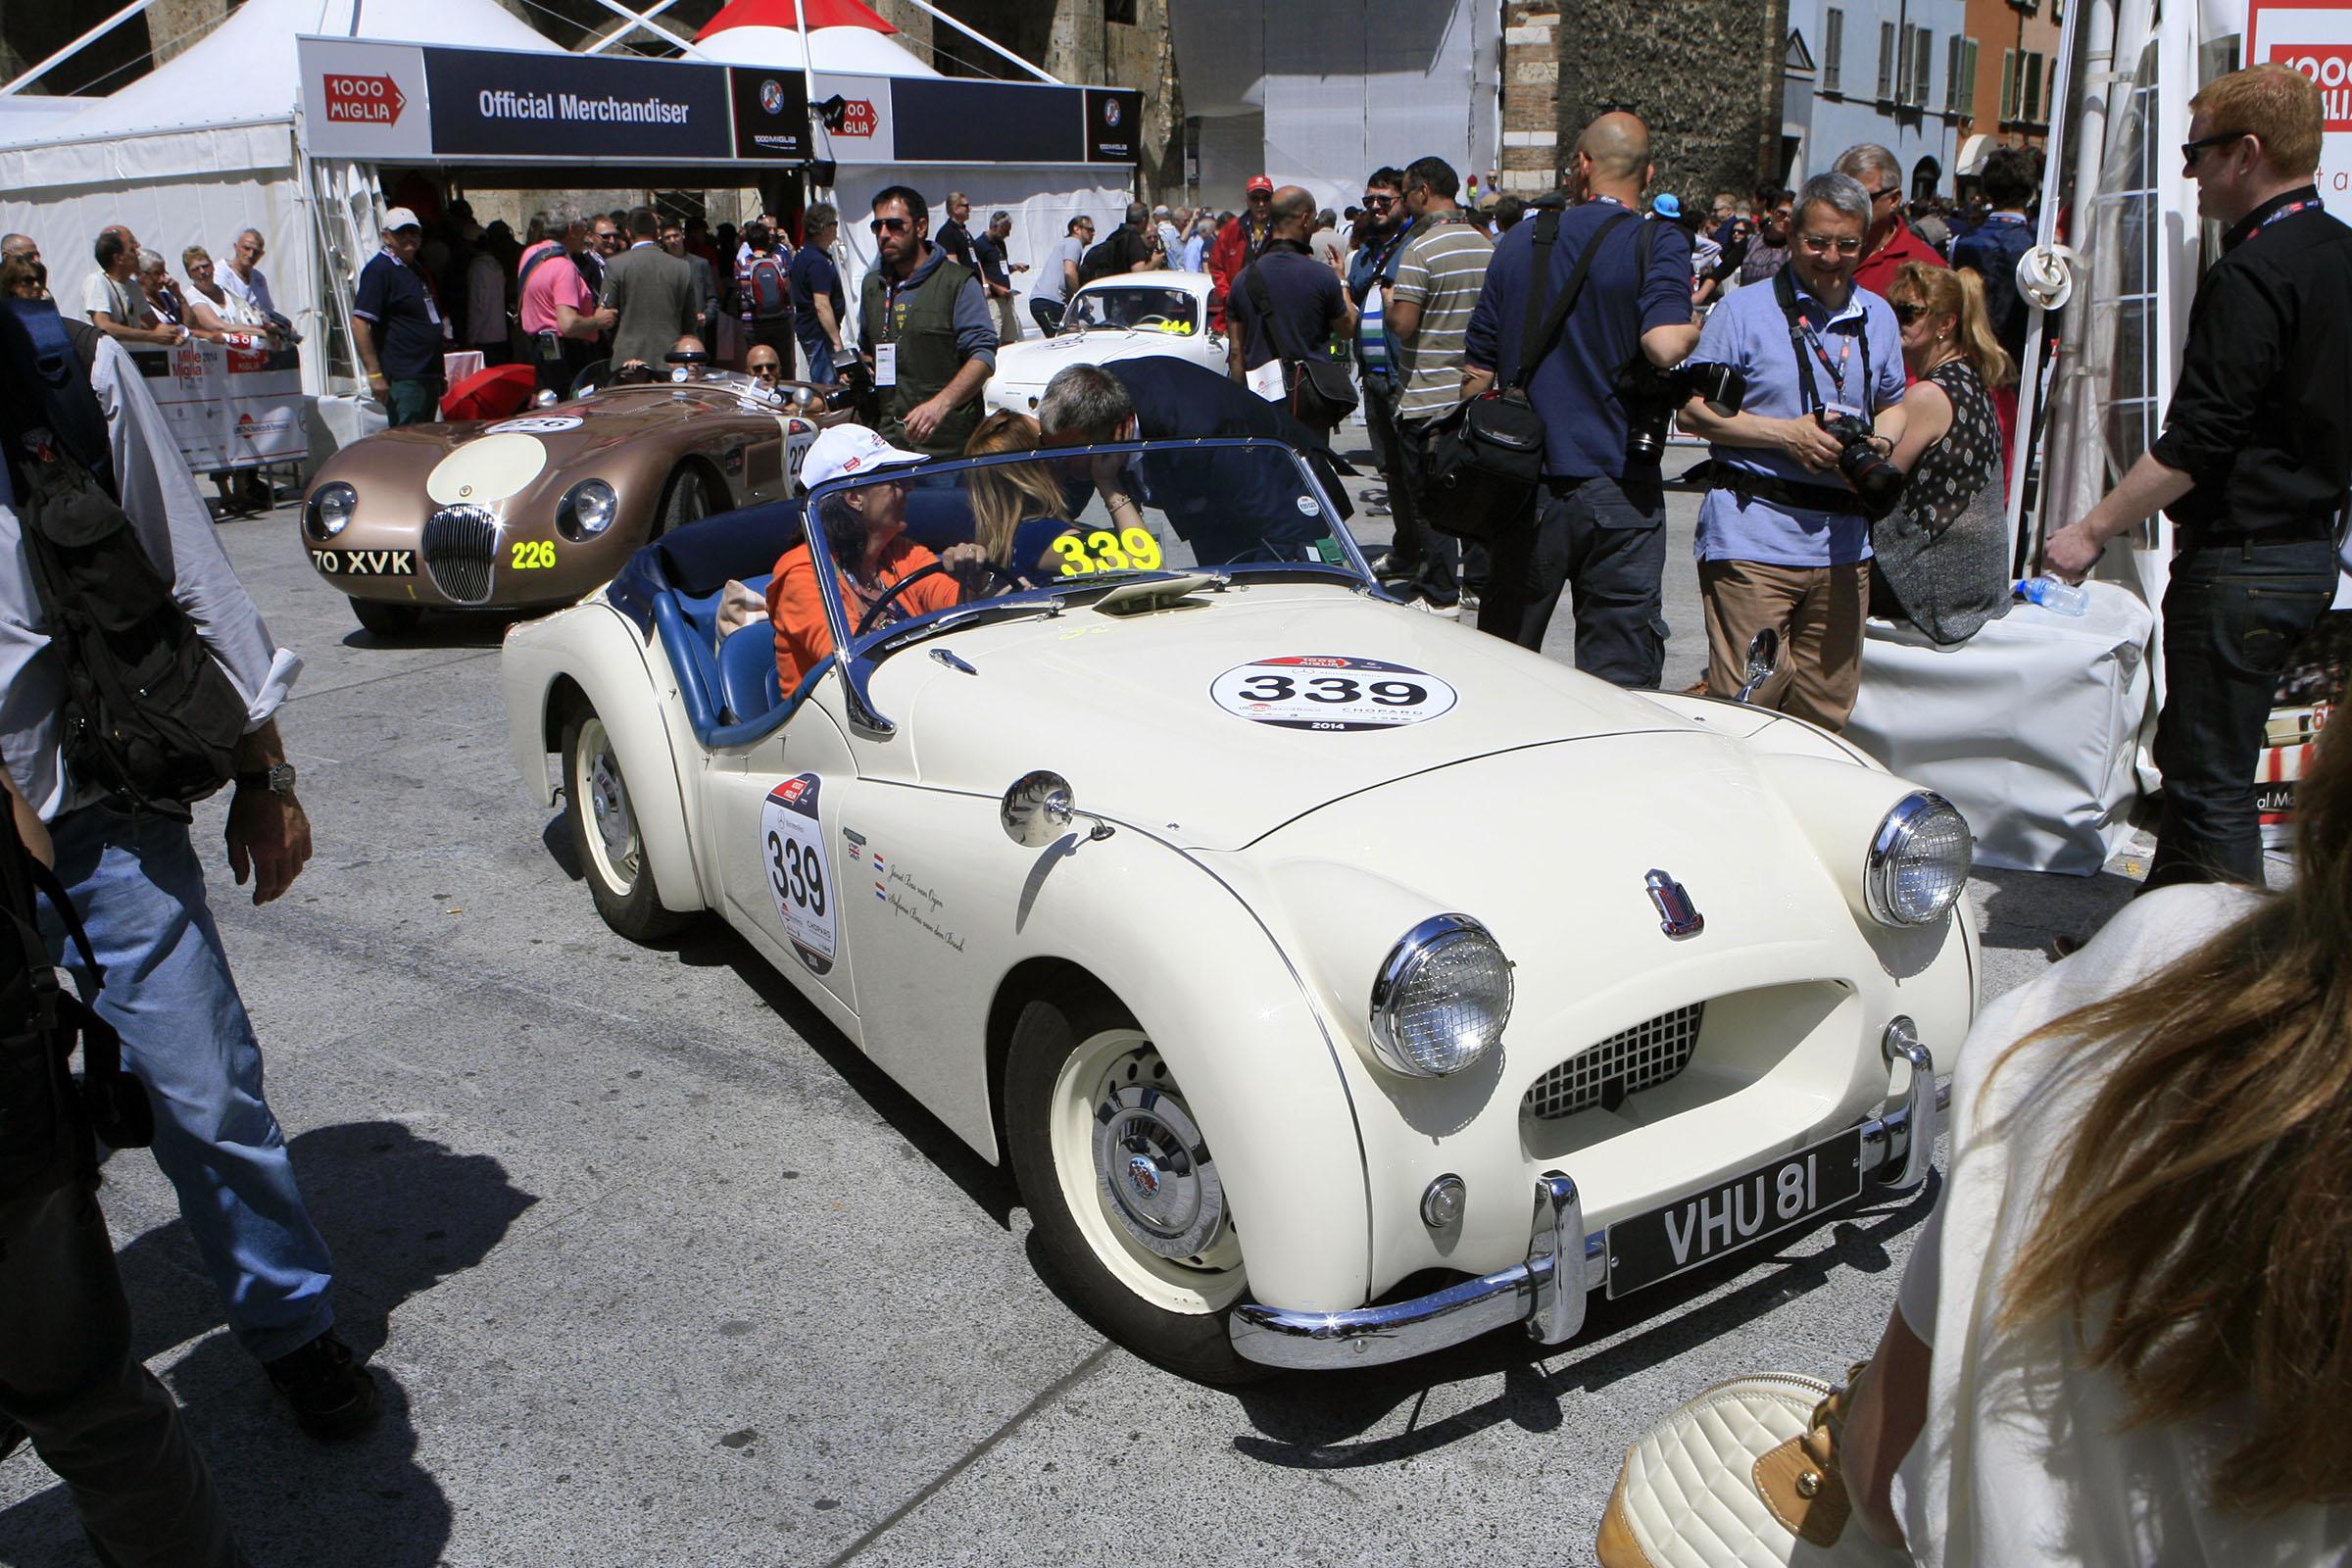 339 - BAS VAN OISEN Trinetta (NL) + BAS VAN DE BROEK Anton (NL) - Triumph TR 2 Sports (1955)